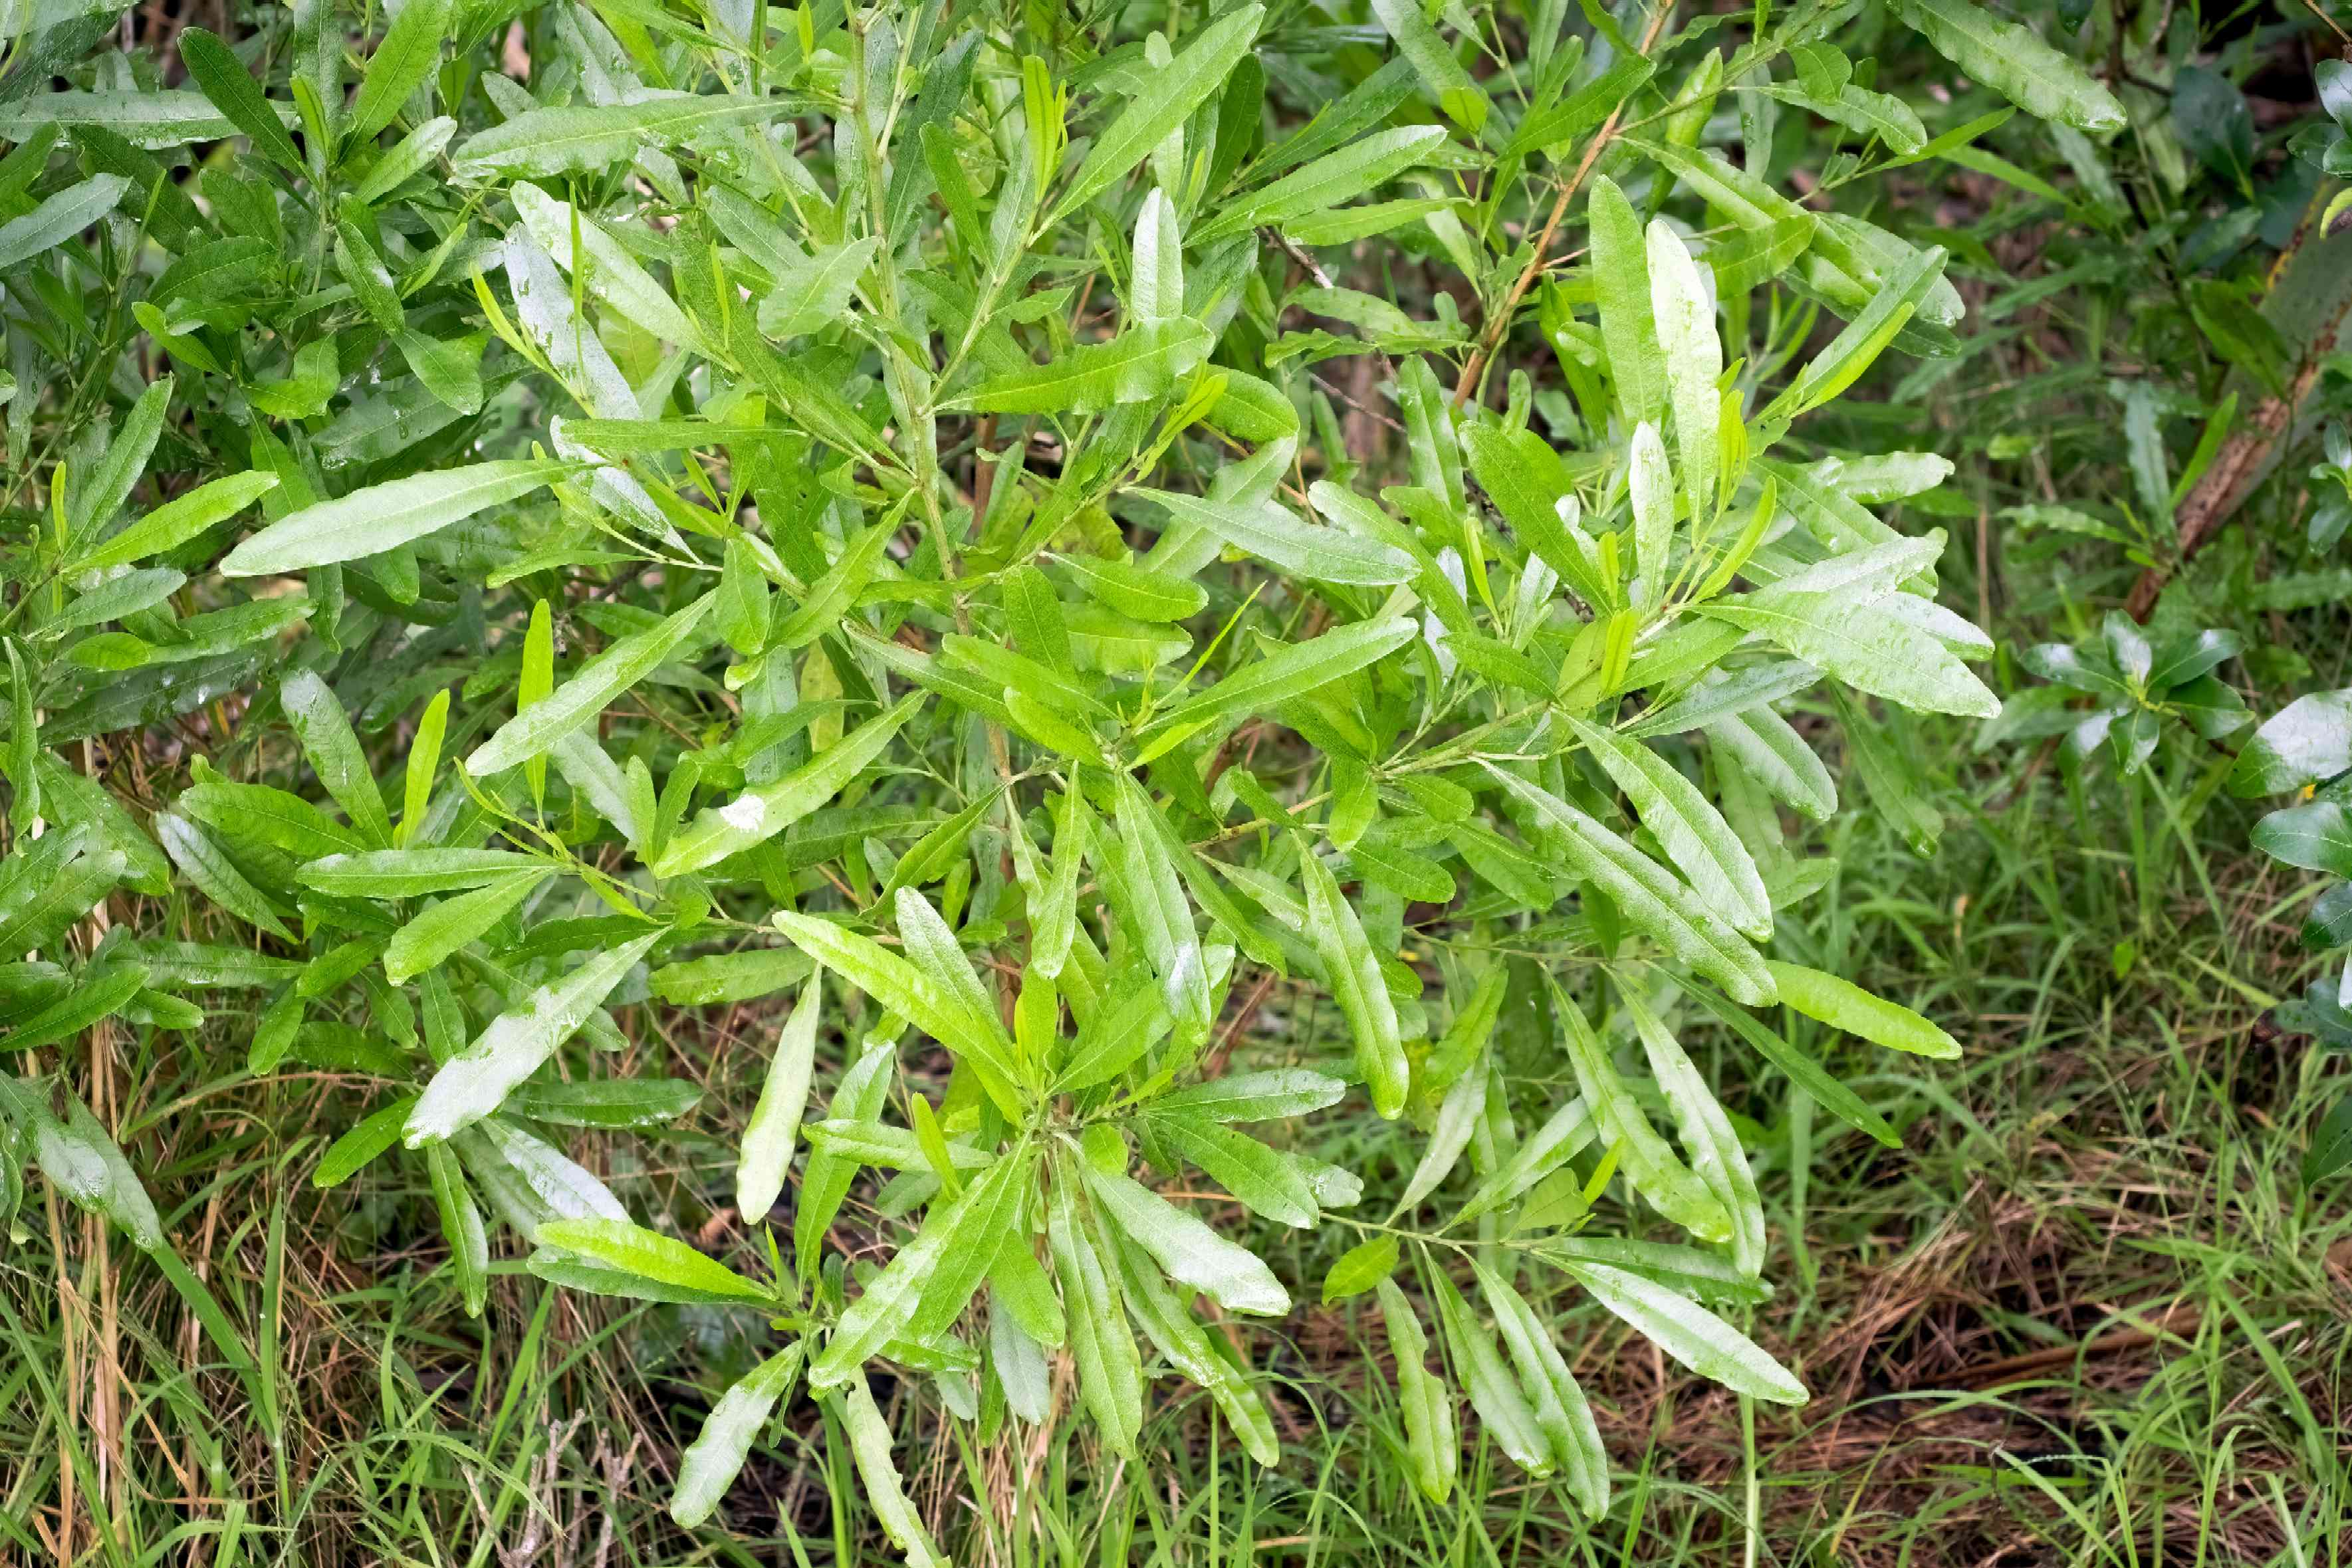 Hopbush shrub with shiny and narrow leaves surrounded by grass